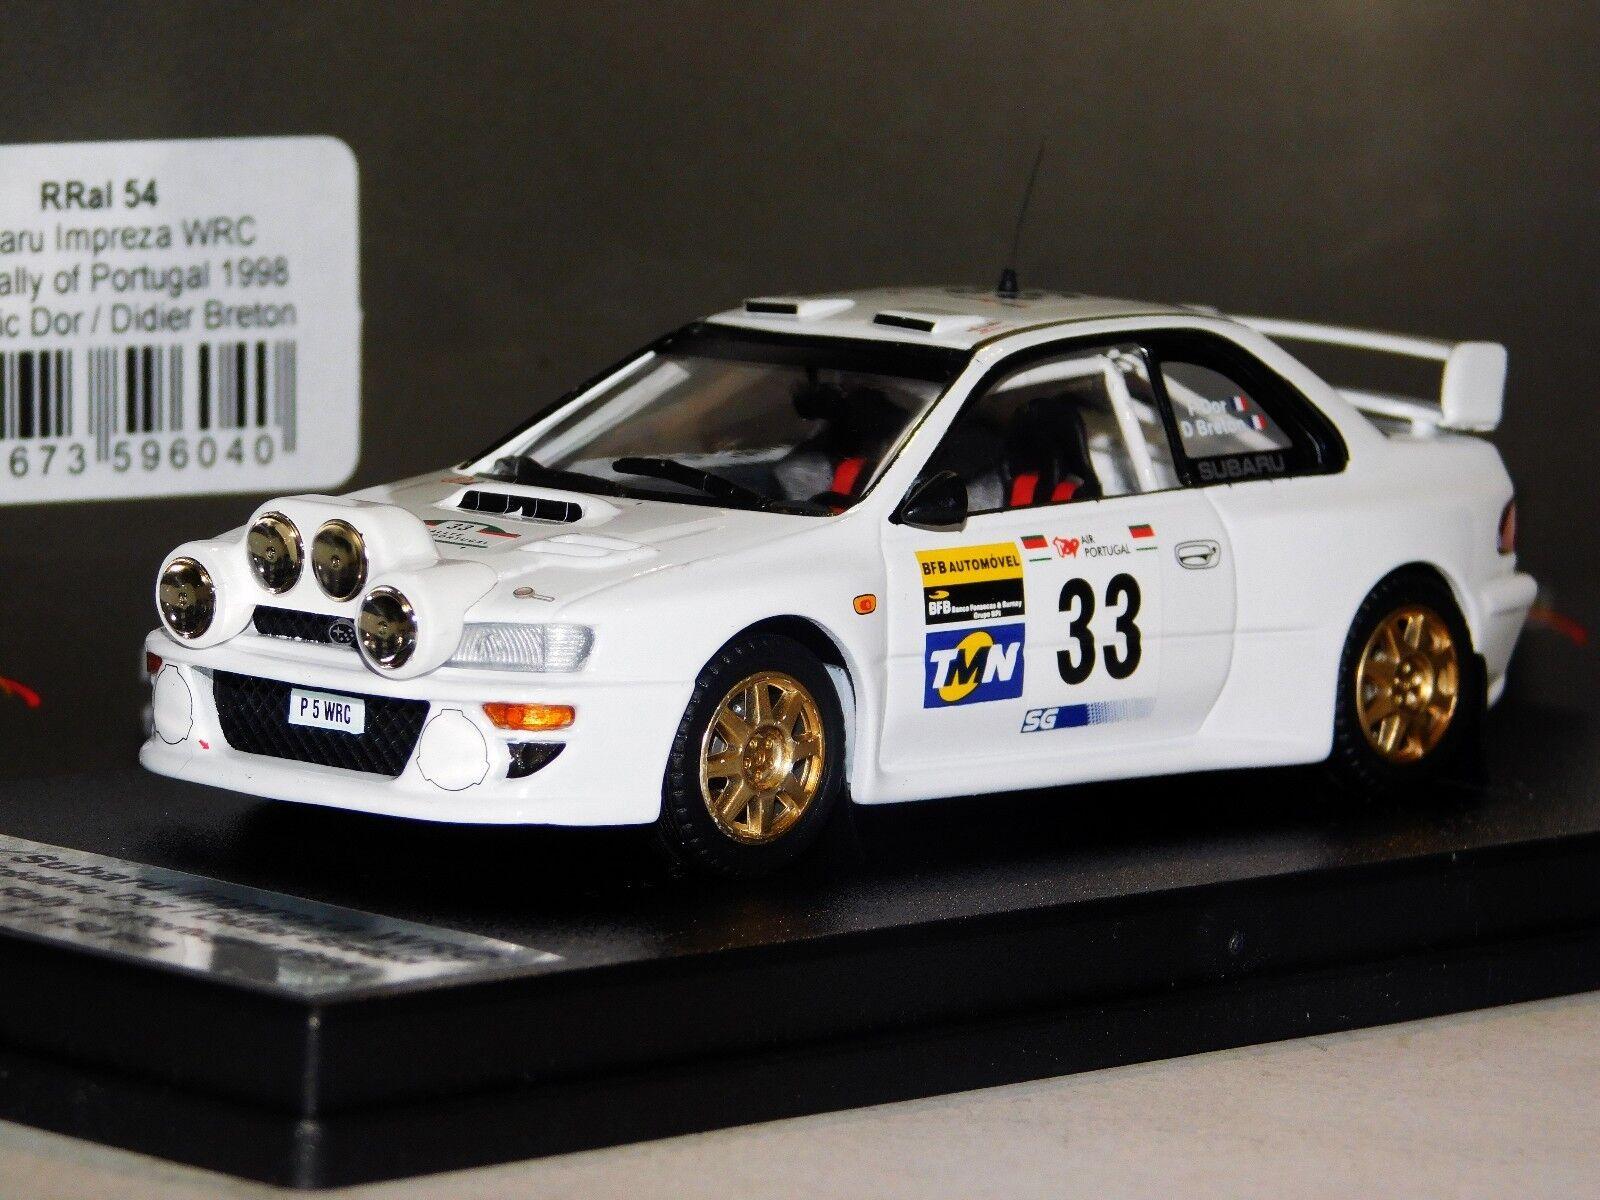 SUBARU IMPREZA WRC  33 DOR PORTUGAL1998 NIGHT VERSION LIM. TROFEU RRAL54 1 43